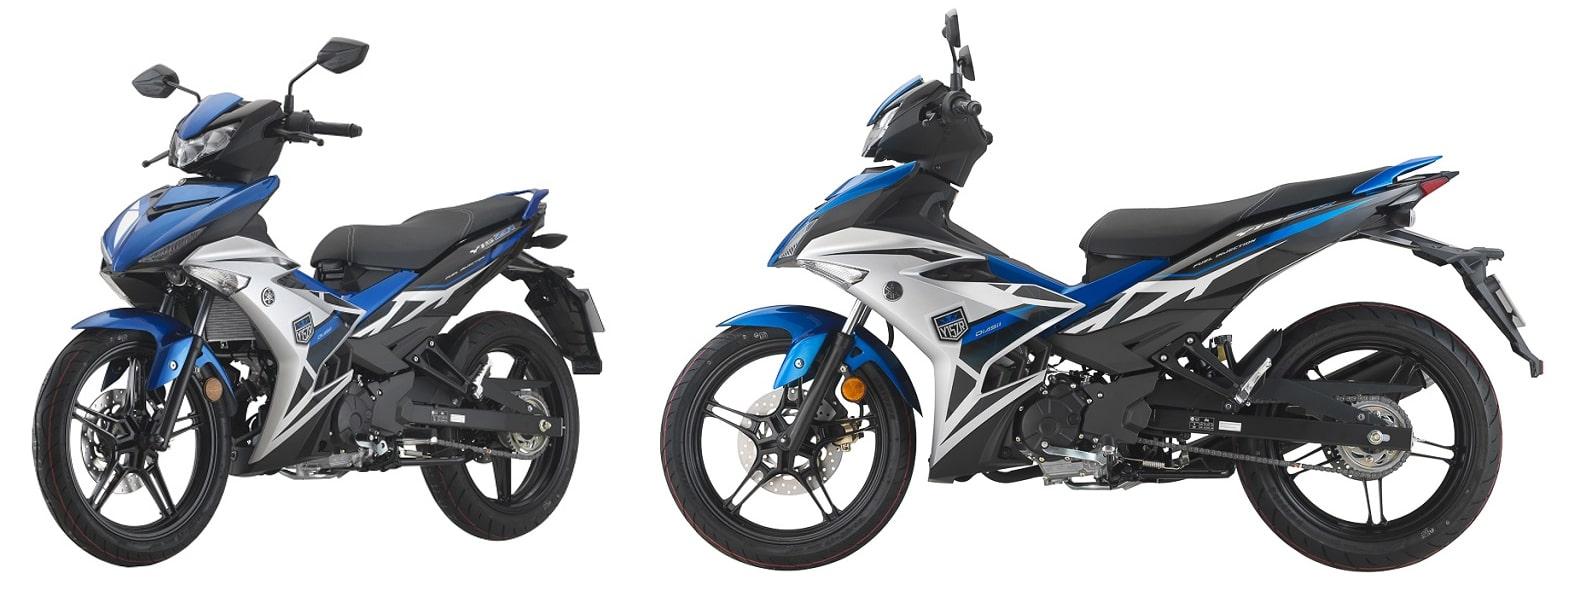 Yamaha Y15ZR 2020 สีน้ำเงิน